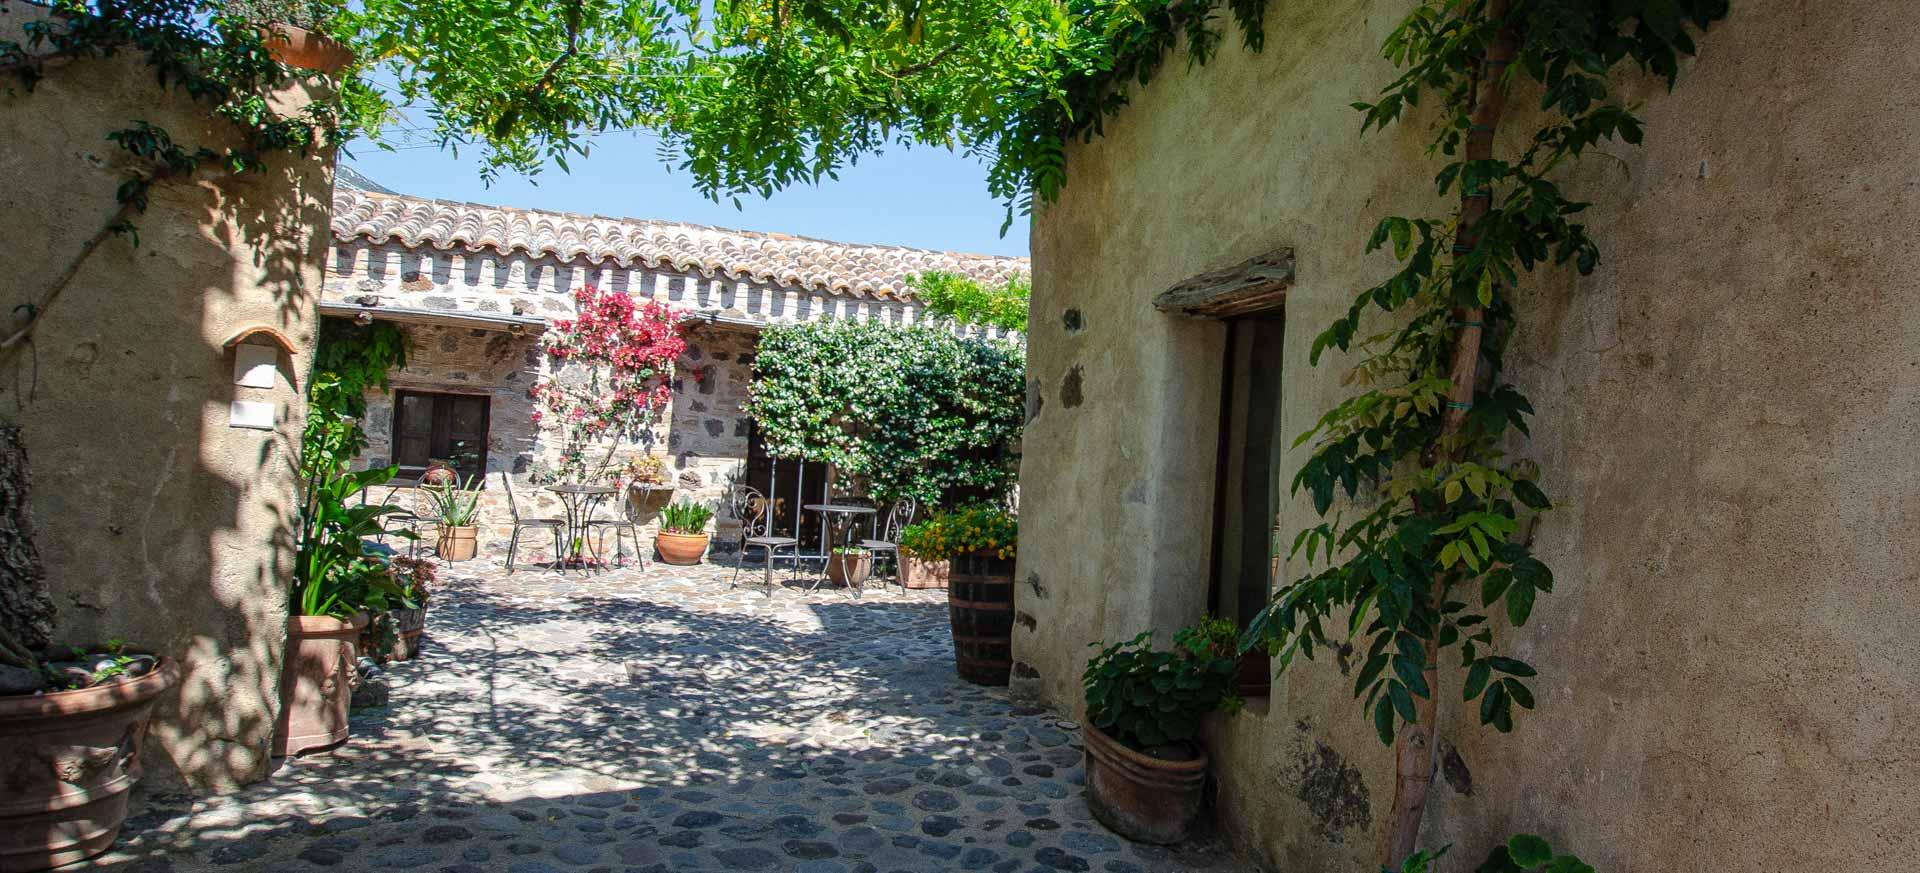 H tels de charme sardaigne italie hote italia for Sardaigne boutique hotel